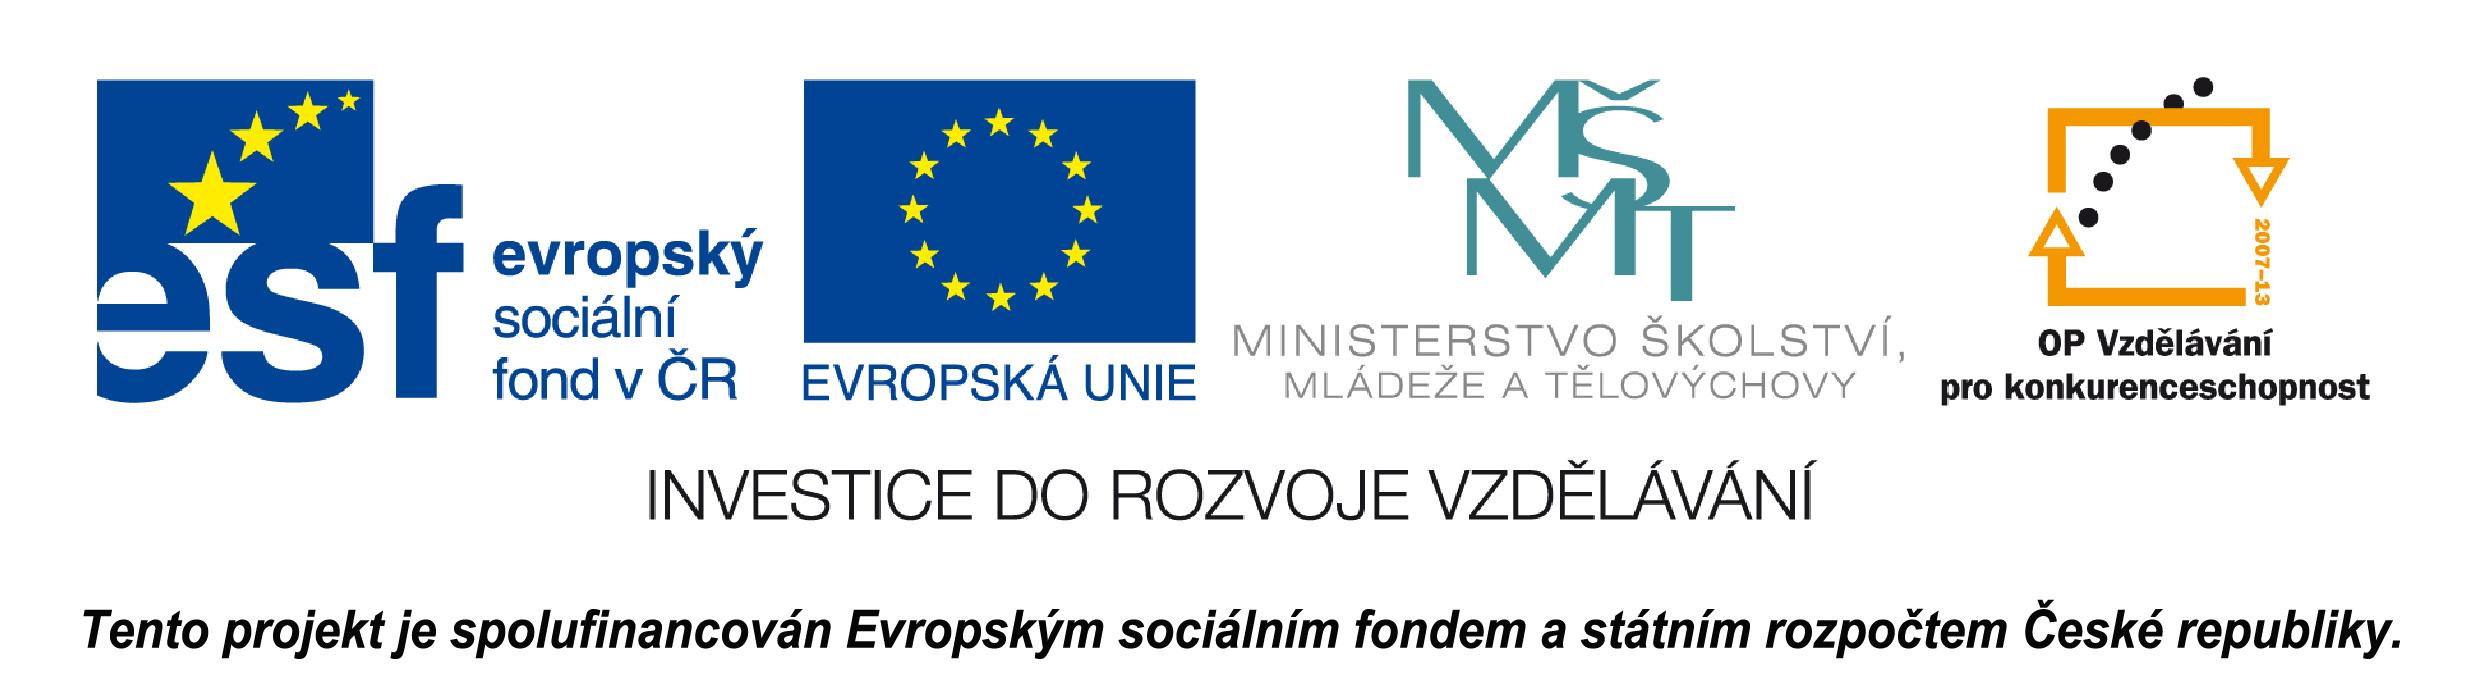 logolink_veta